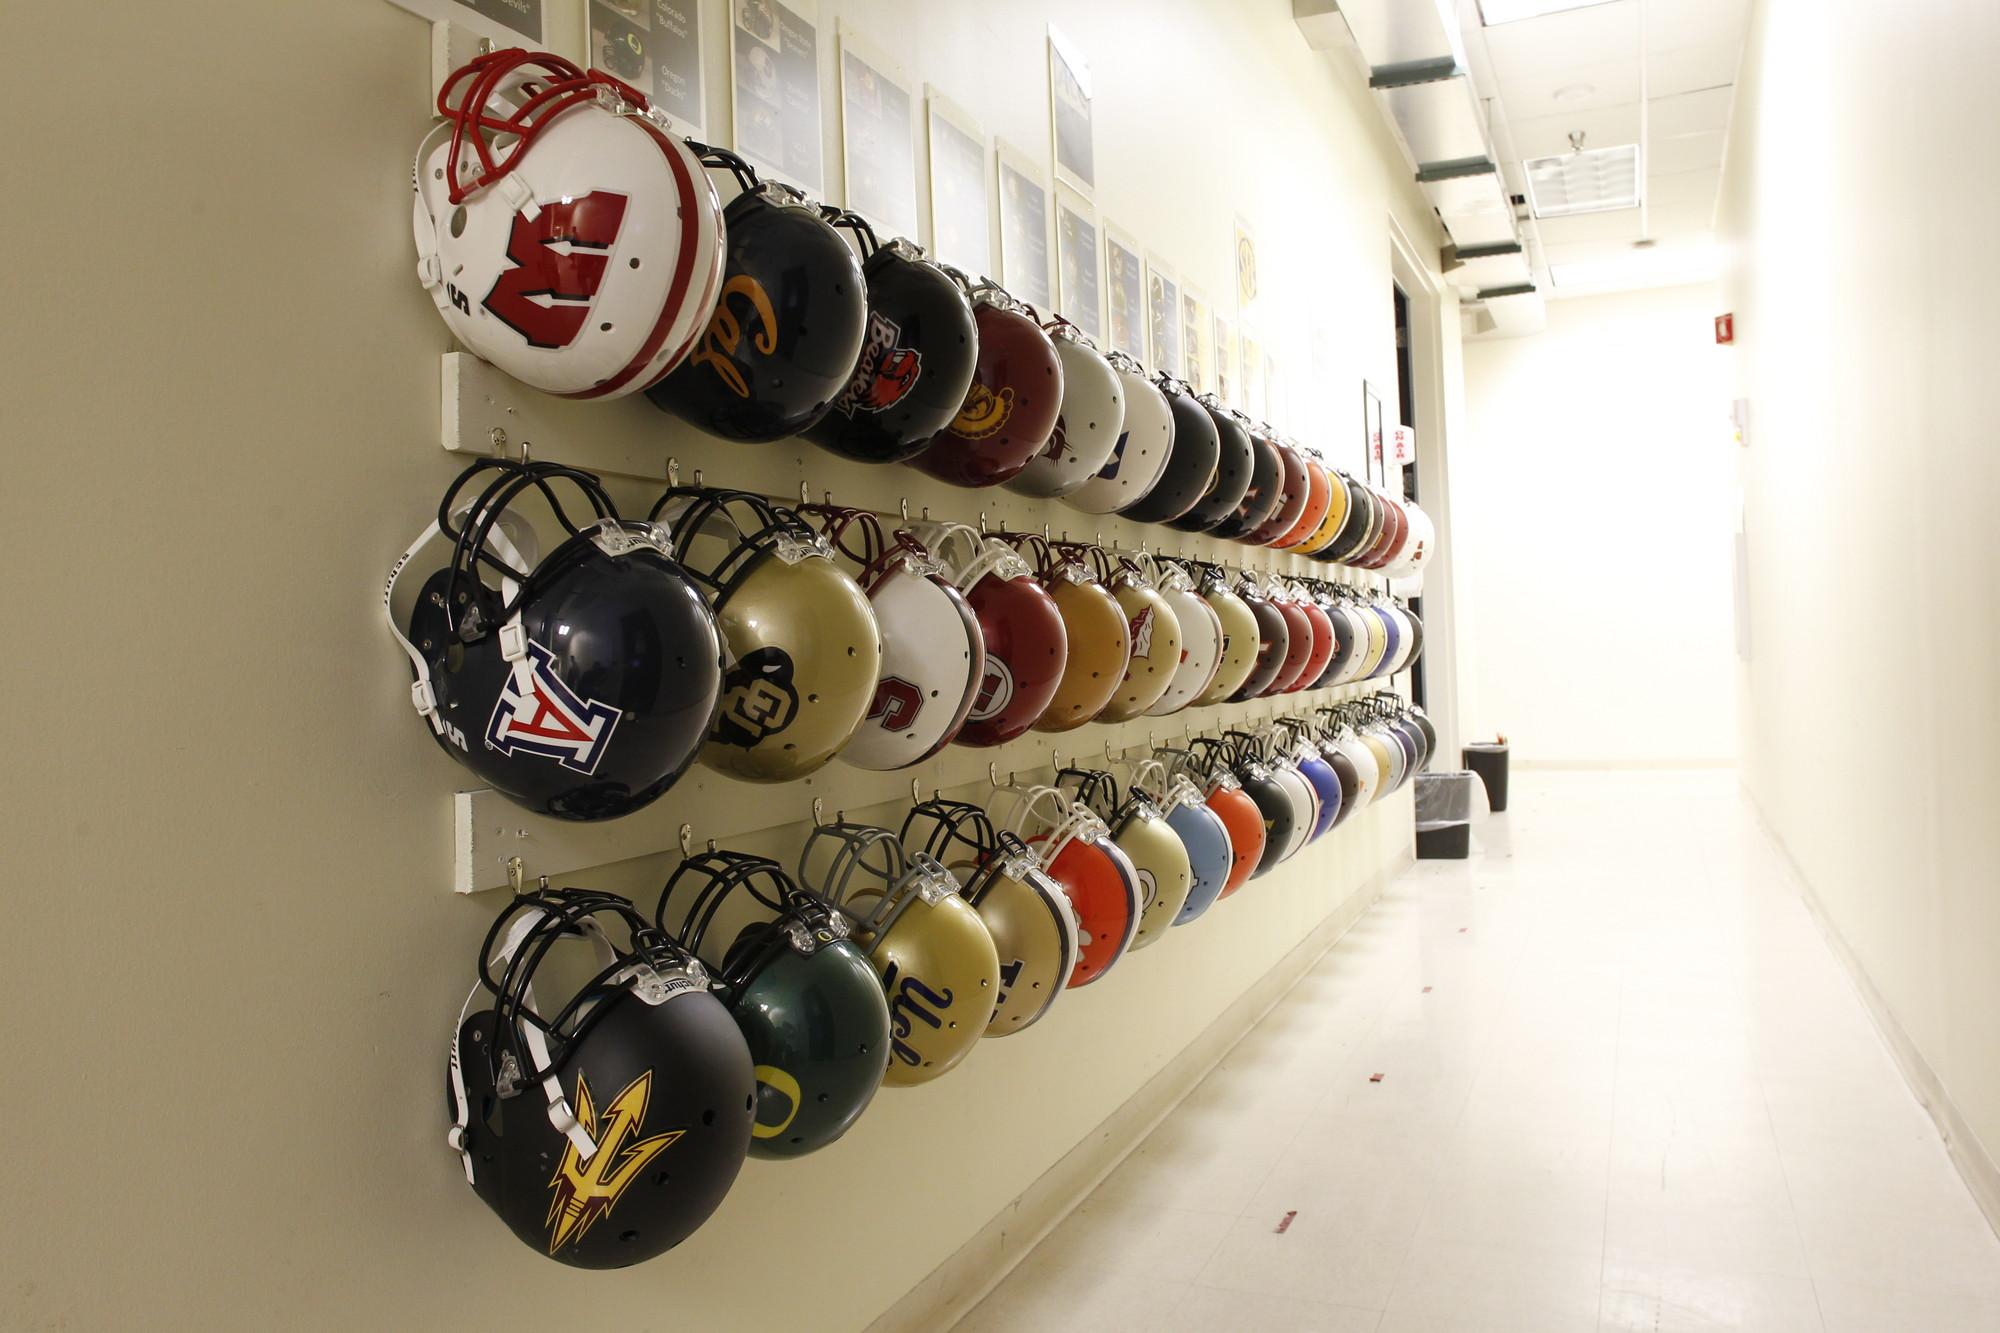 College football helmets - July 11, 2013